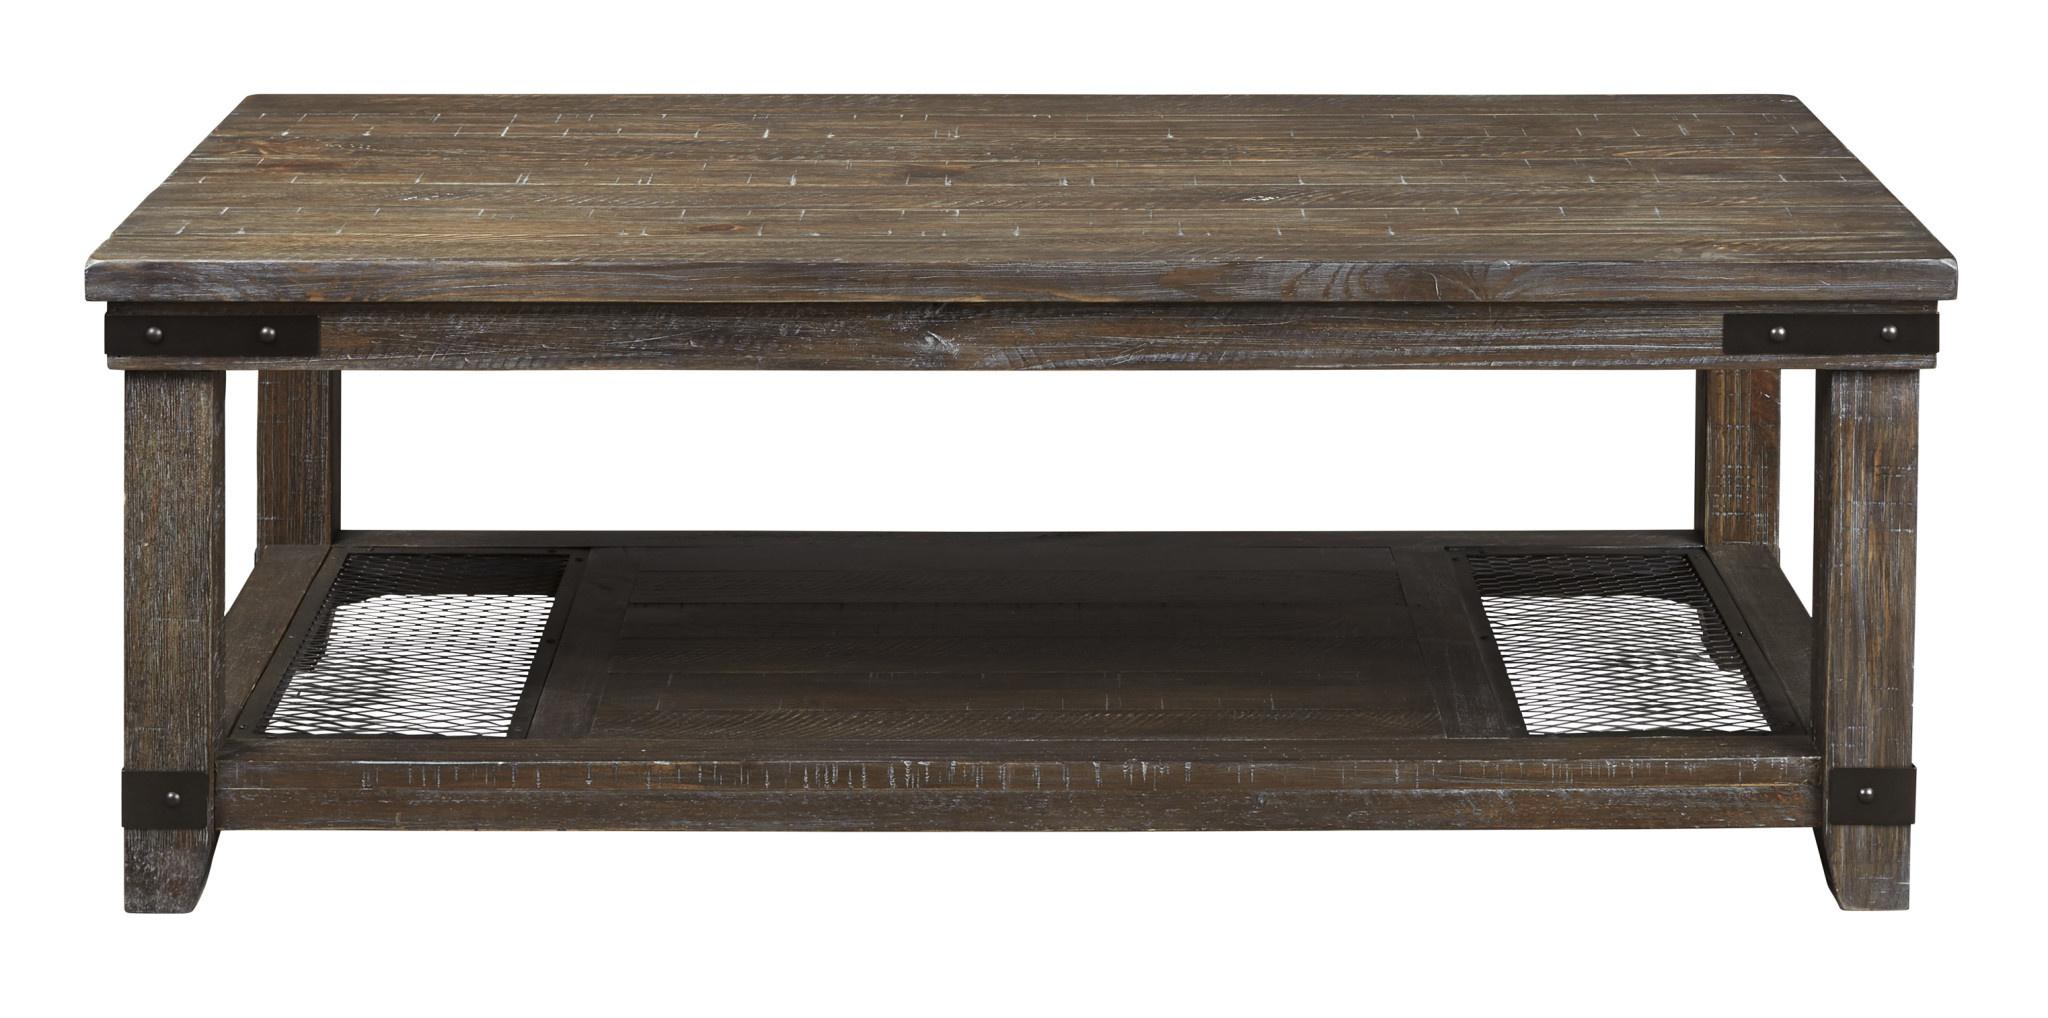 "Signature Design ""Danell Ridge"" Rectangular Coffee Table- Brown- T446-1"